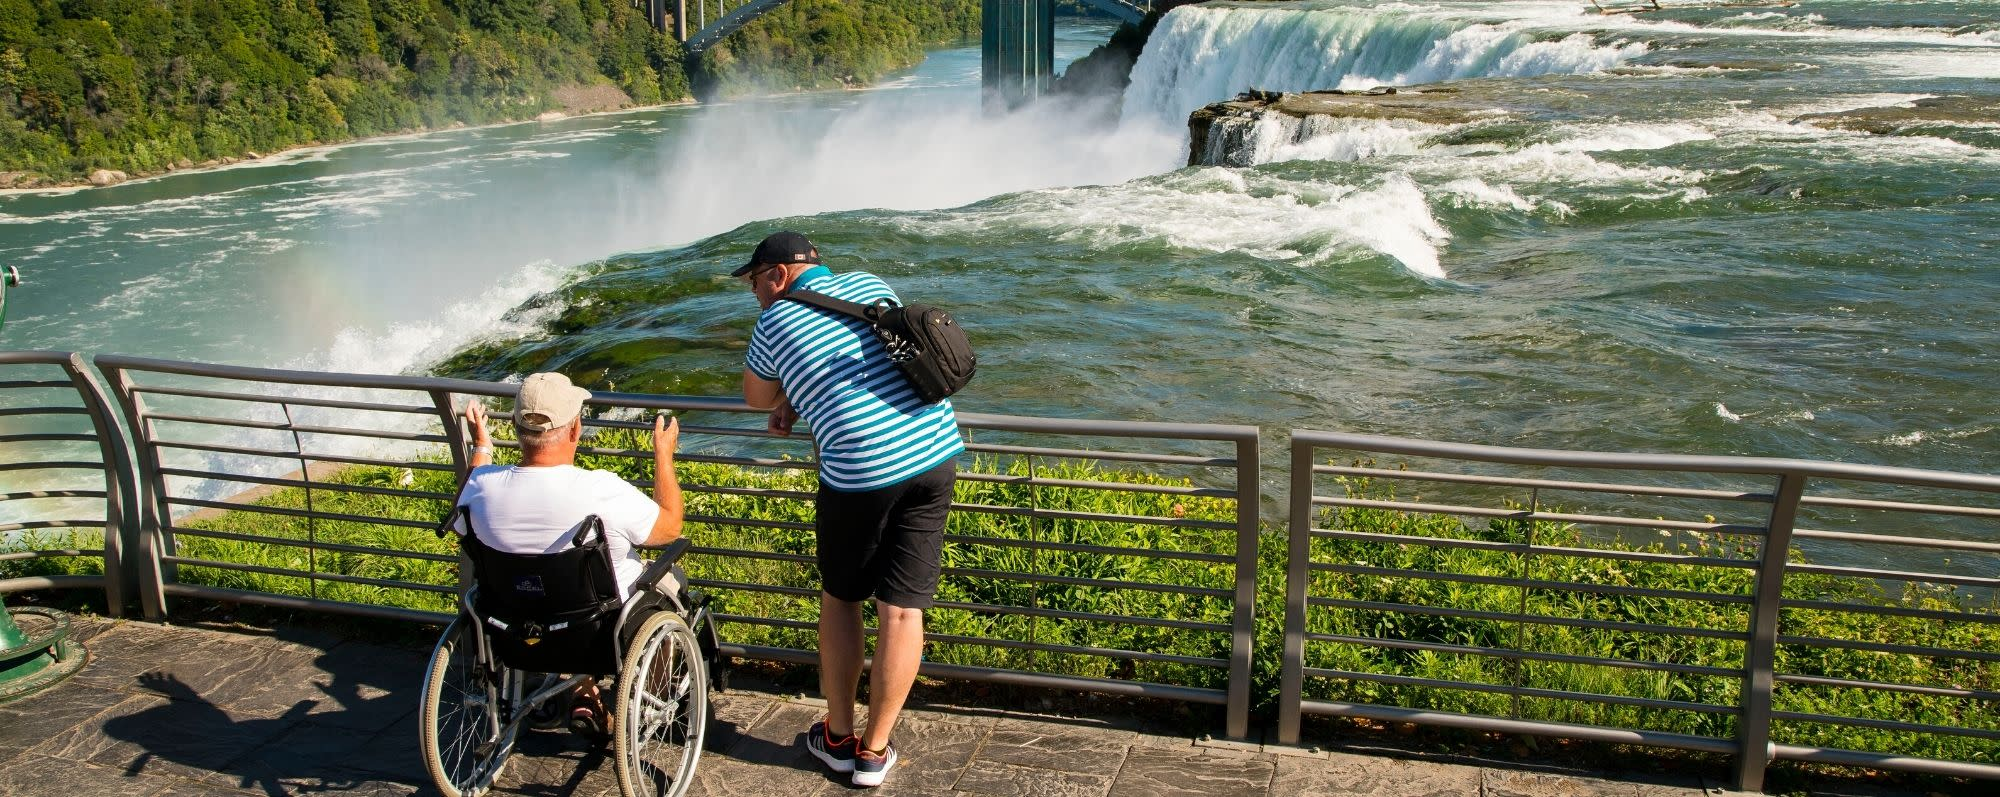 A man in a wheelchair and a companion look out at Niagara Falls